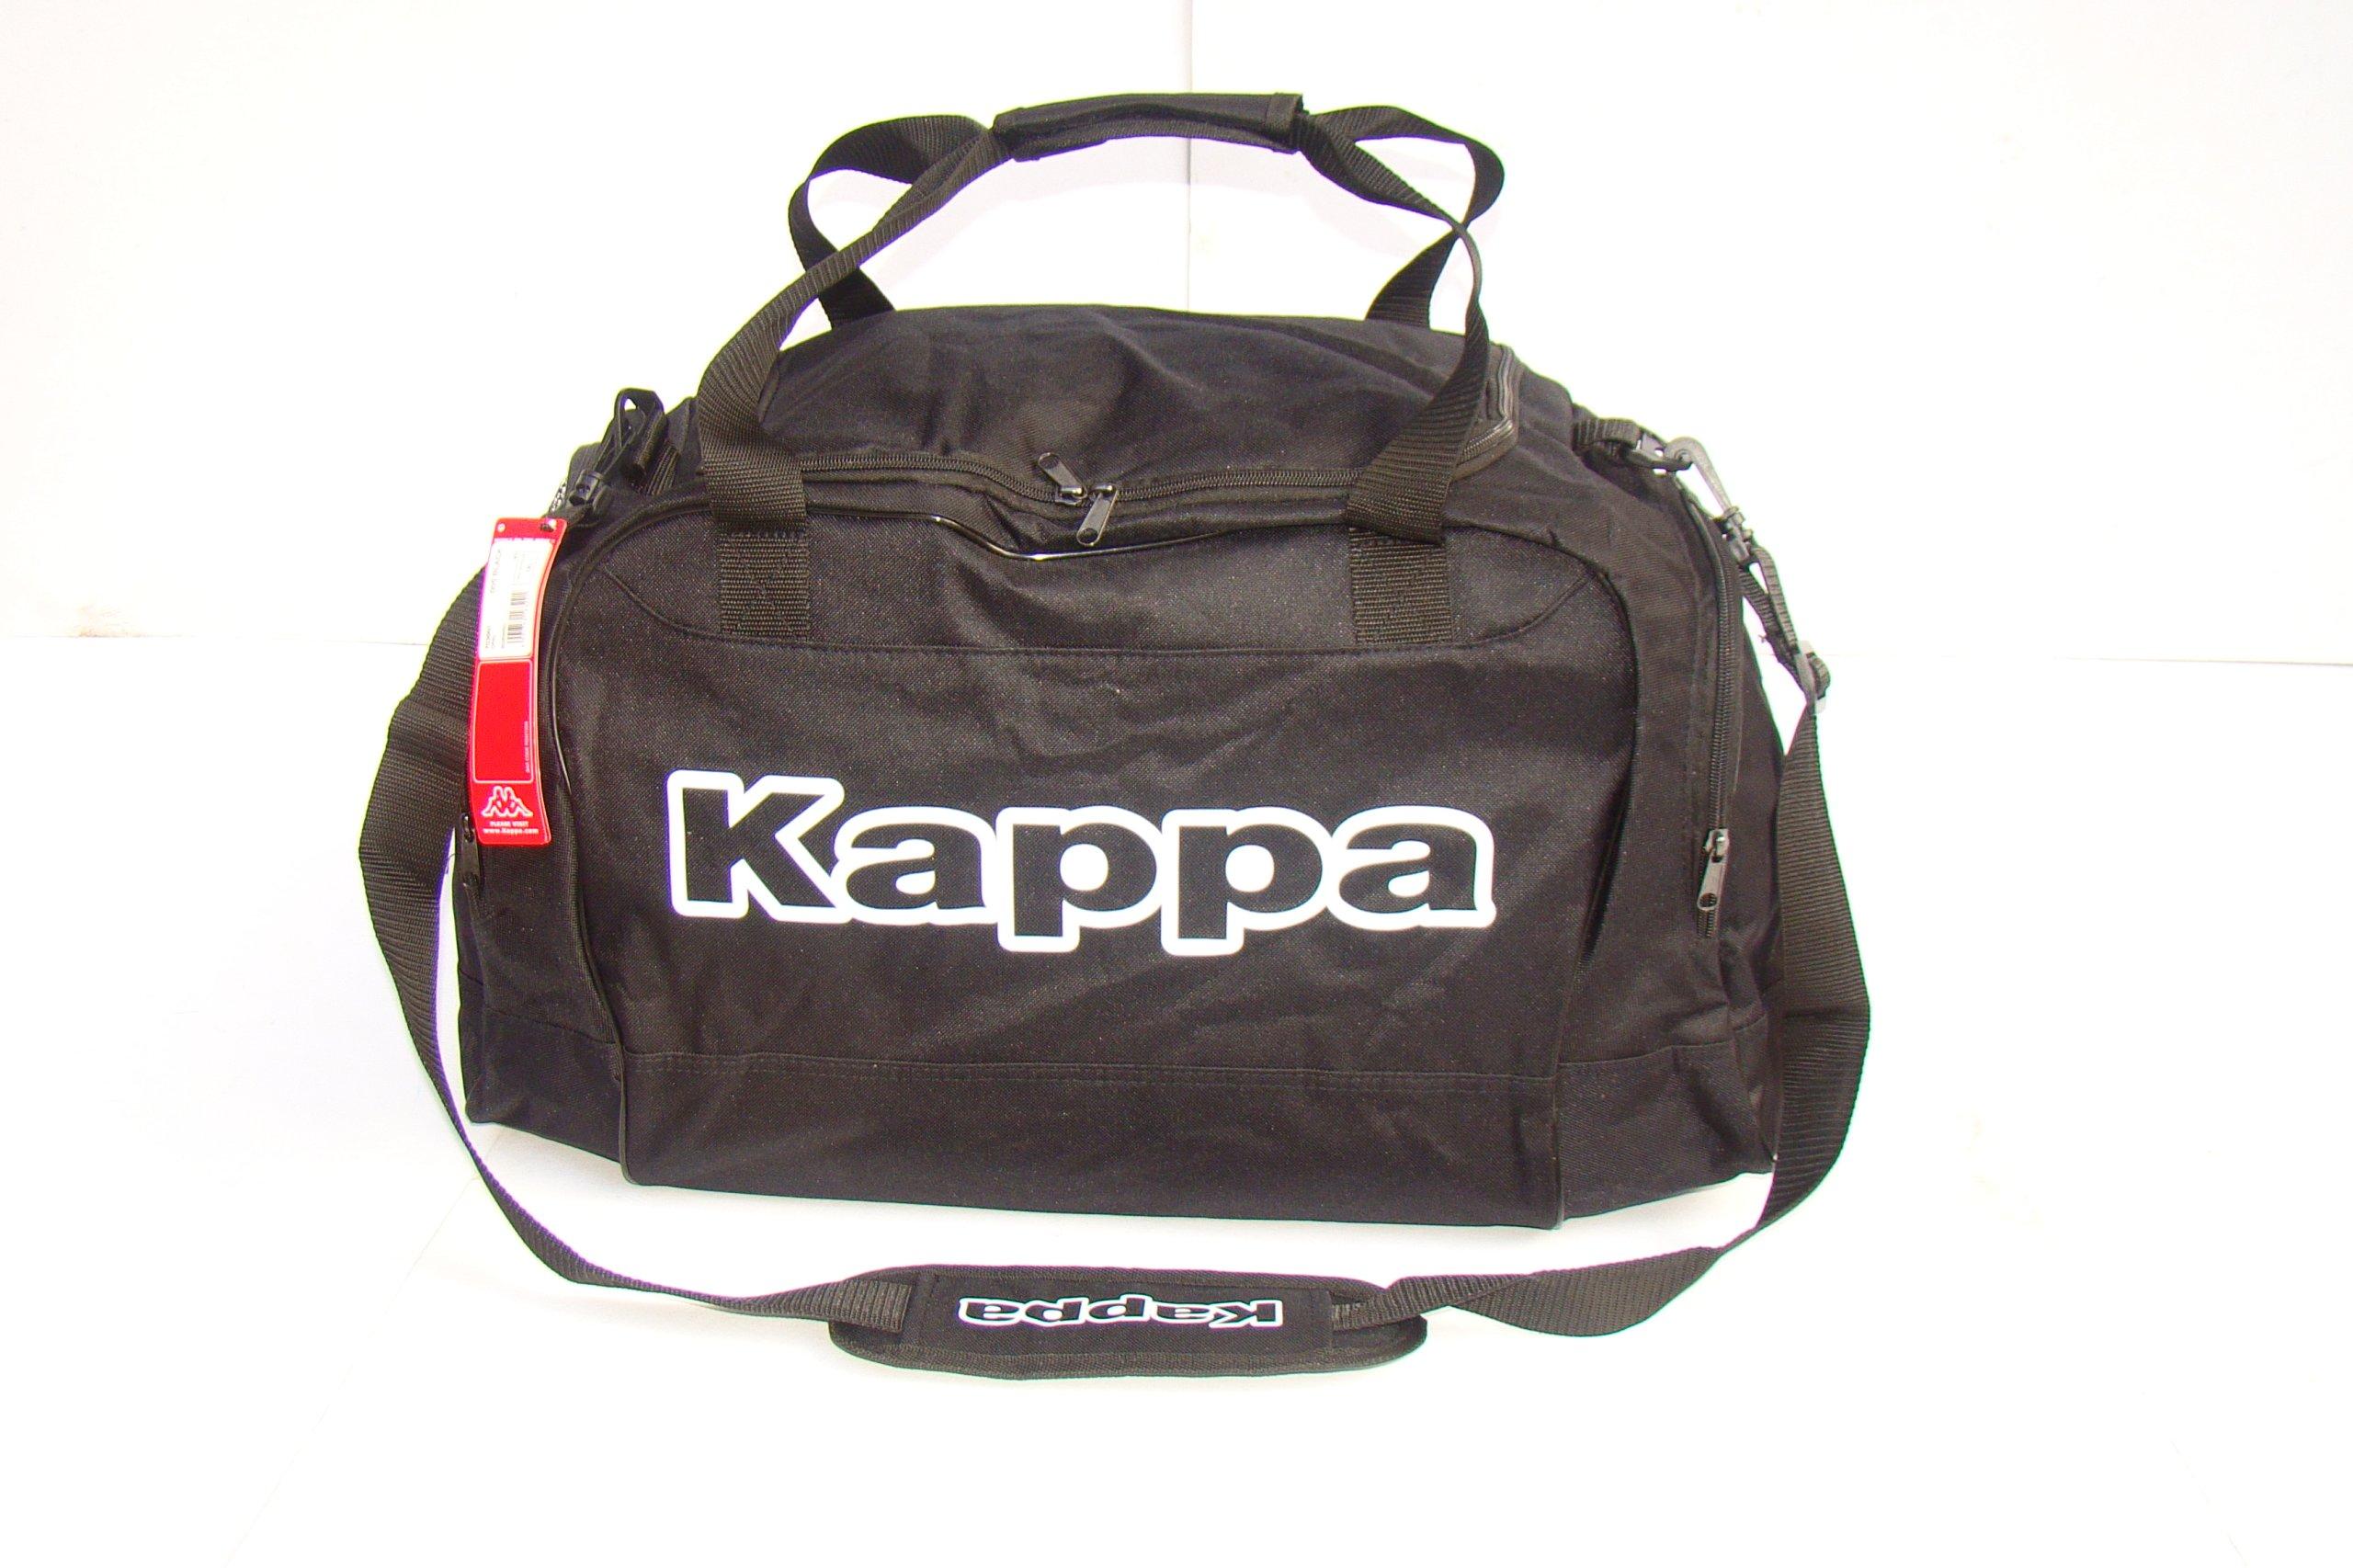 c8a5de09e6269 Torba sportowa męska KAPPA basen siłownia trening - 7200755053 ...